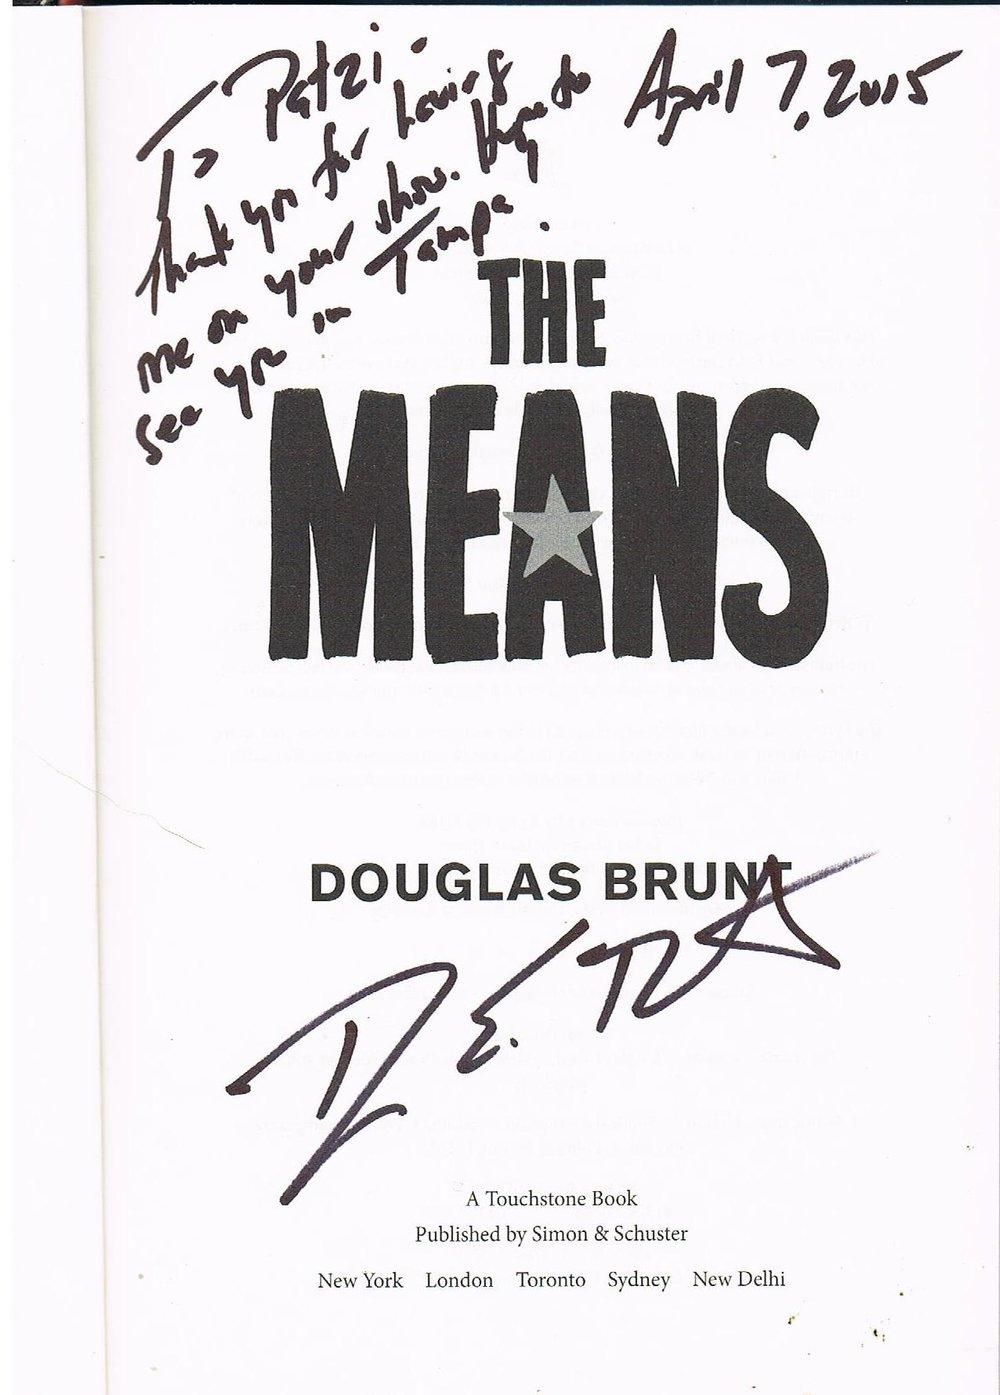 IMAGE-Doug Brunt-Dedication to Patzi.jpg